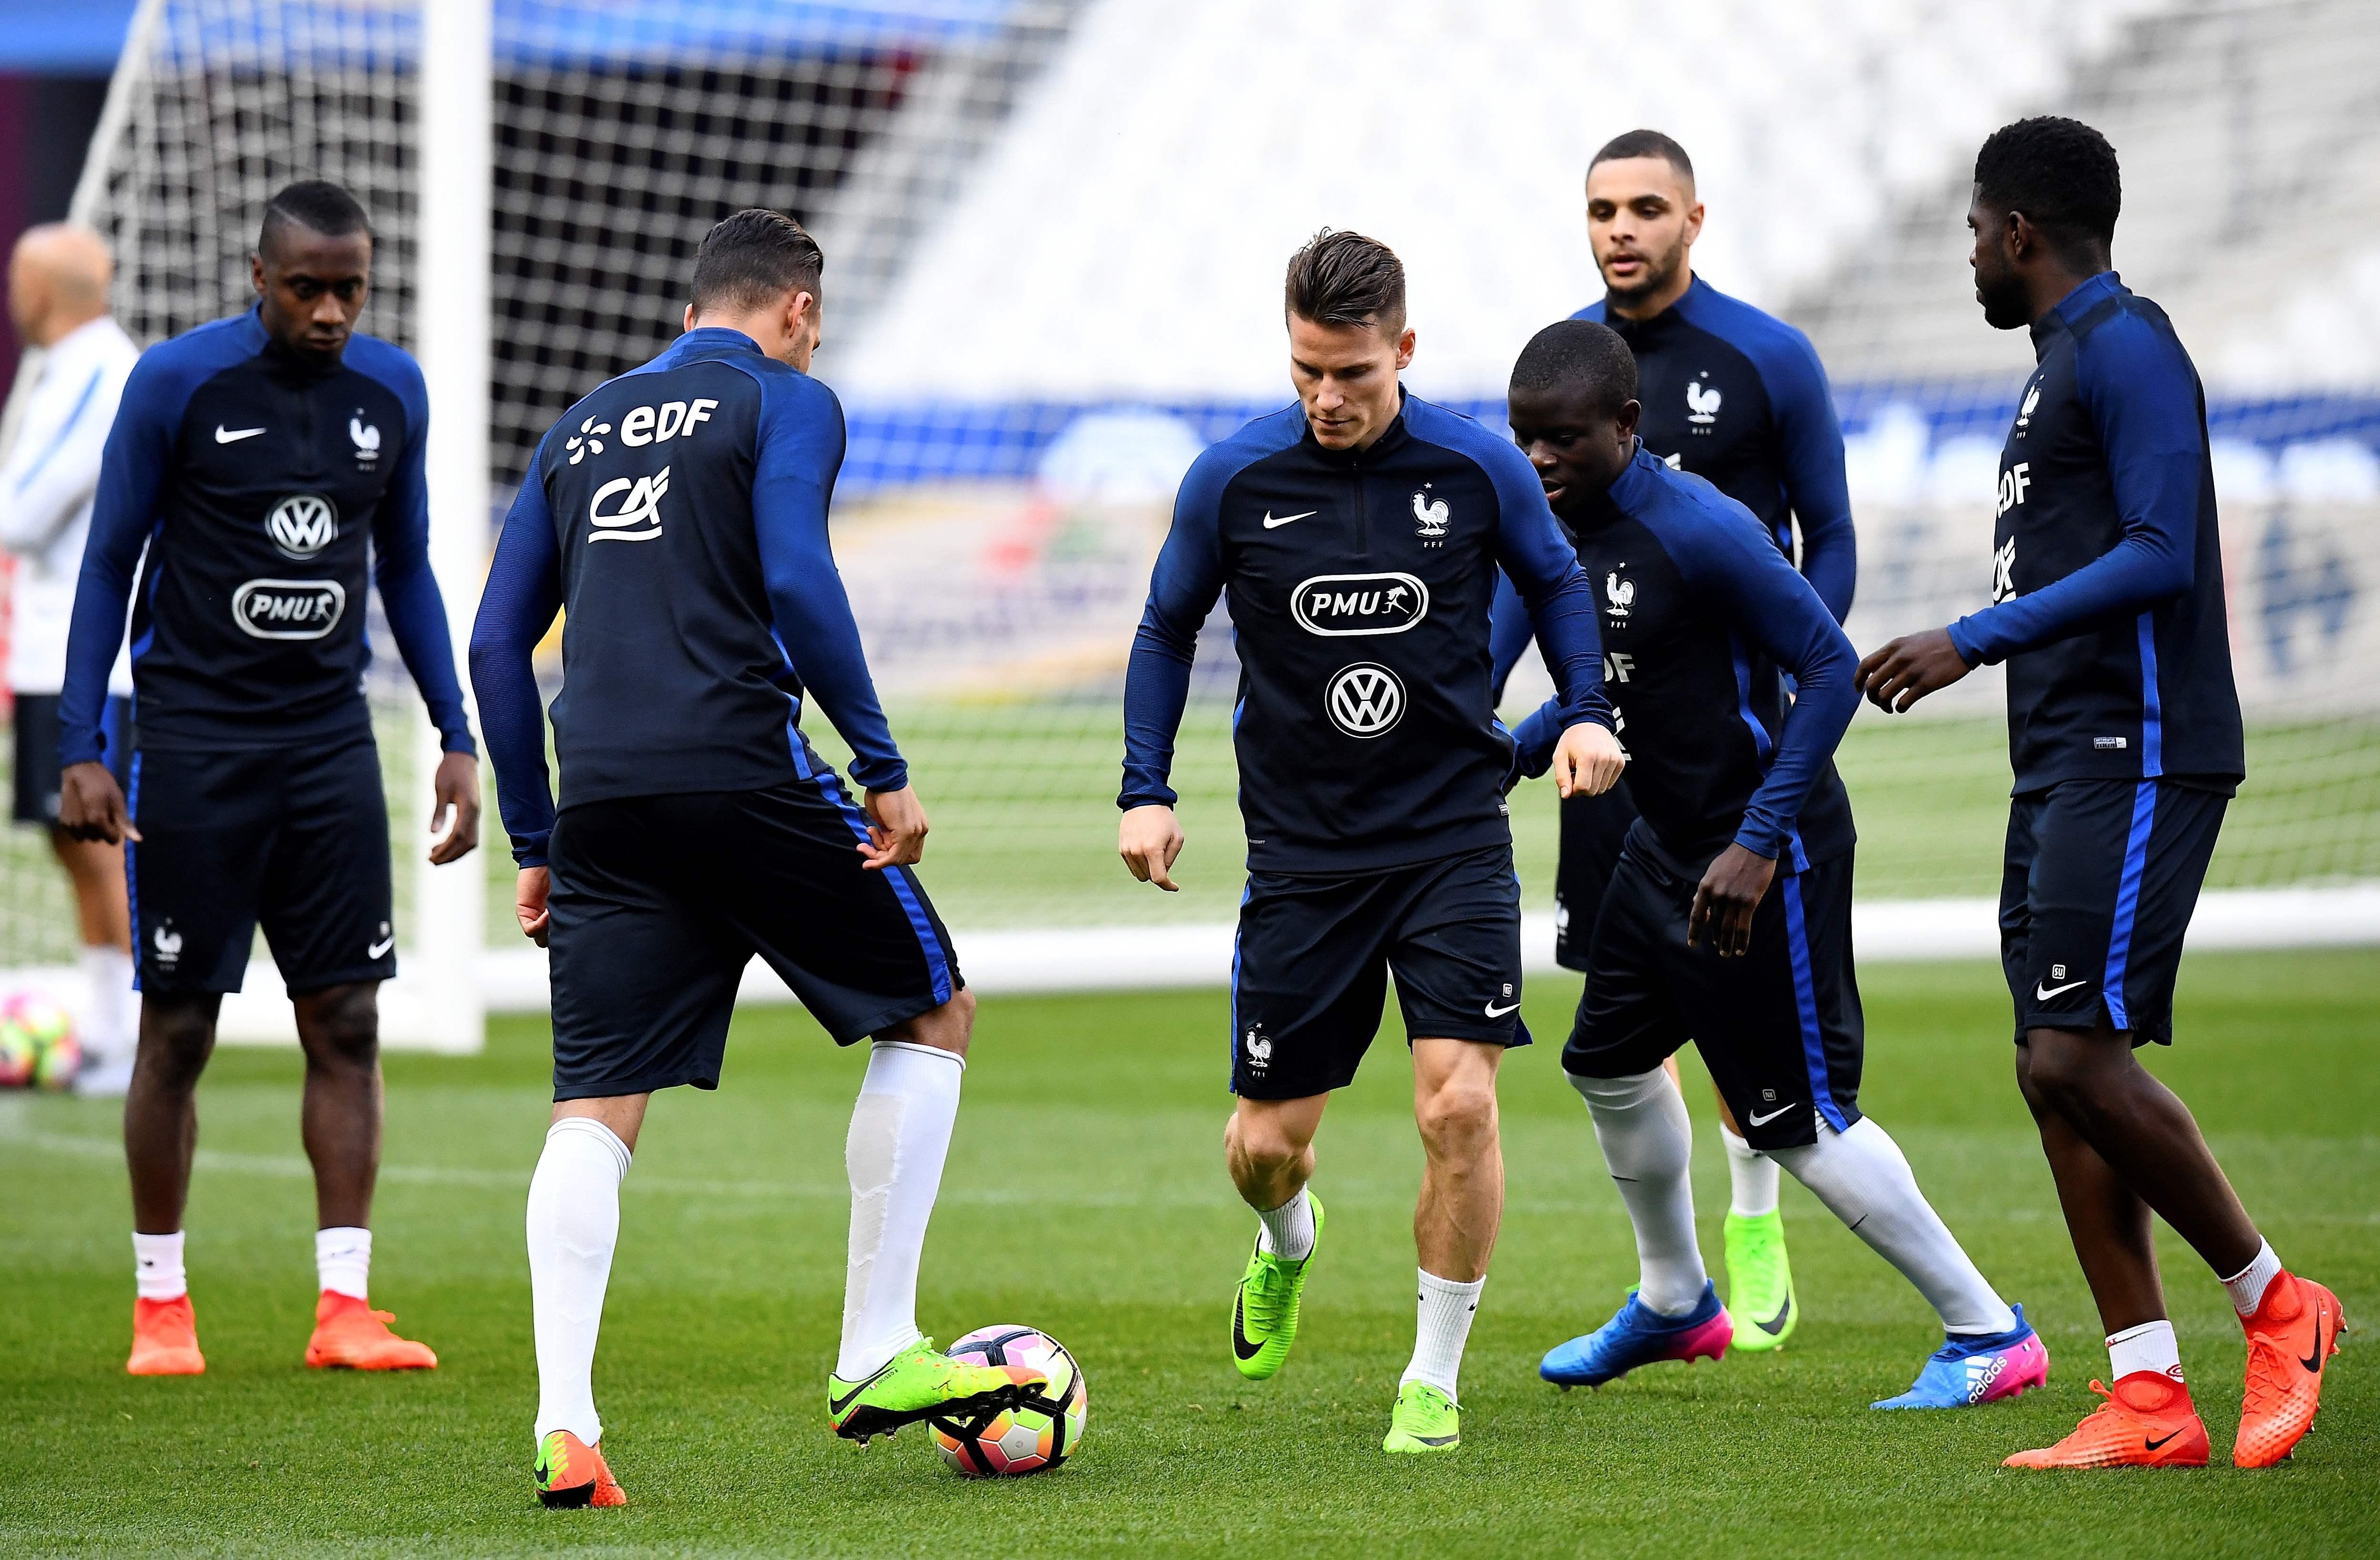 Football - Equipe de France - France-Espagne : avec Lemar et Gameiro d'entrée ?